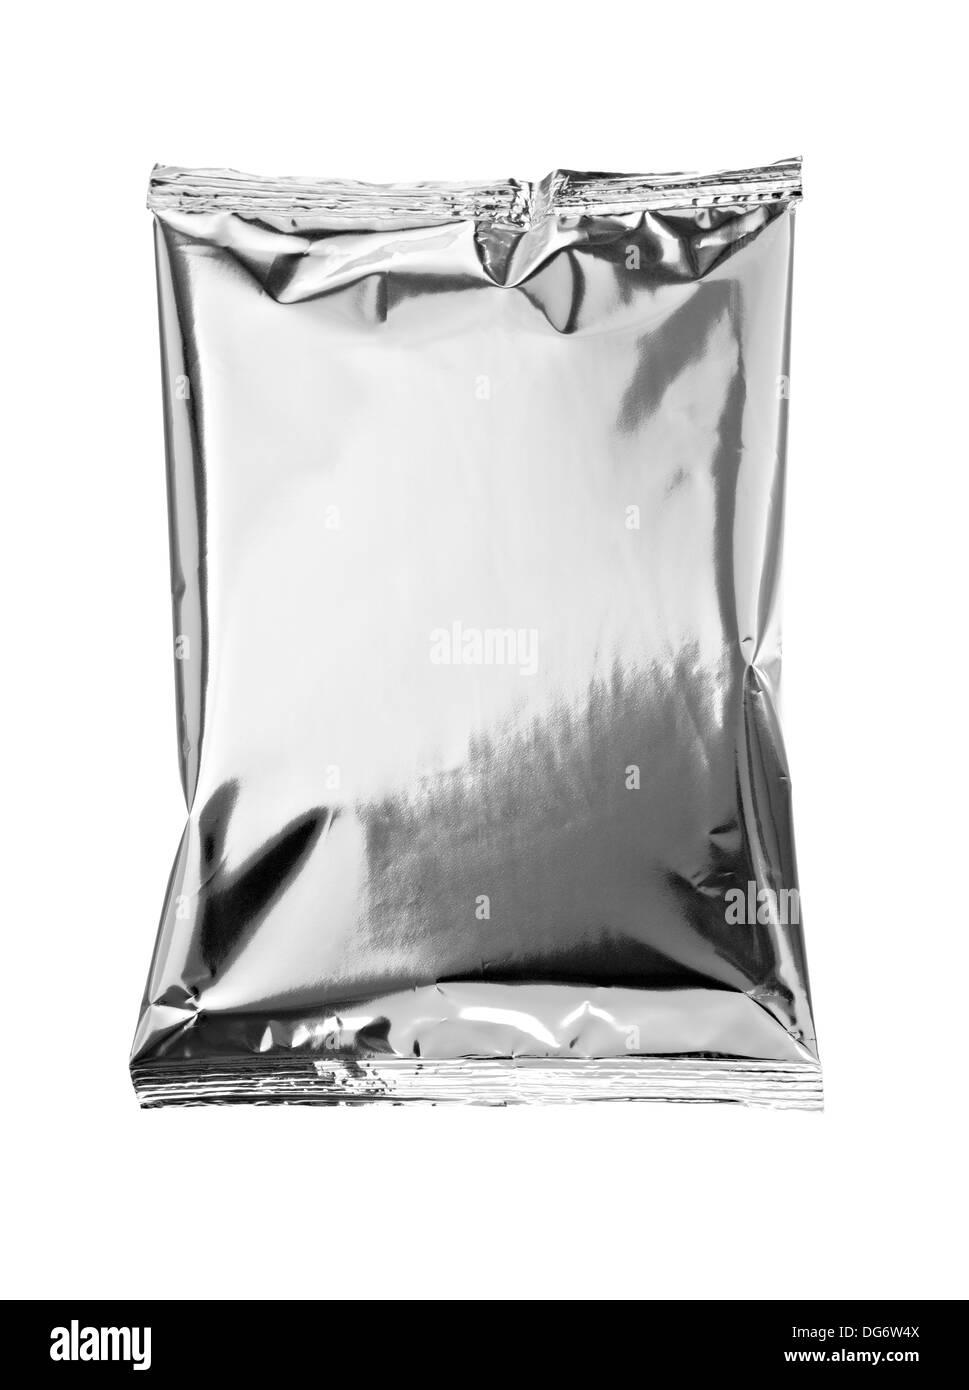 bag template - Stock Image